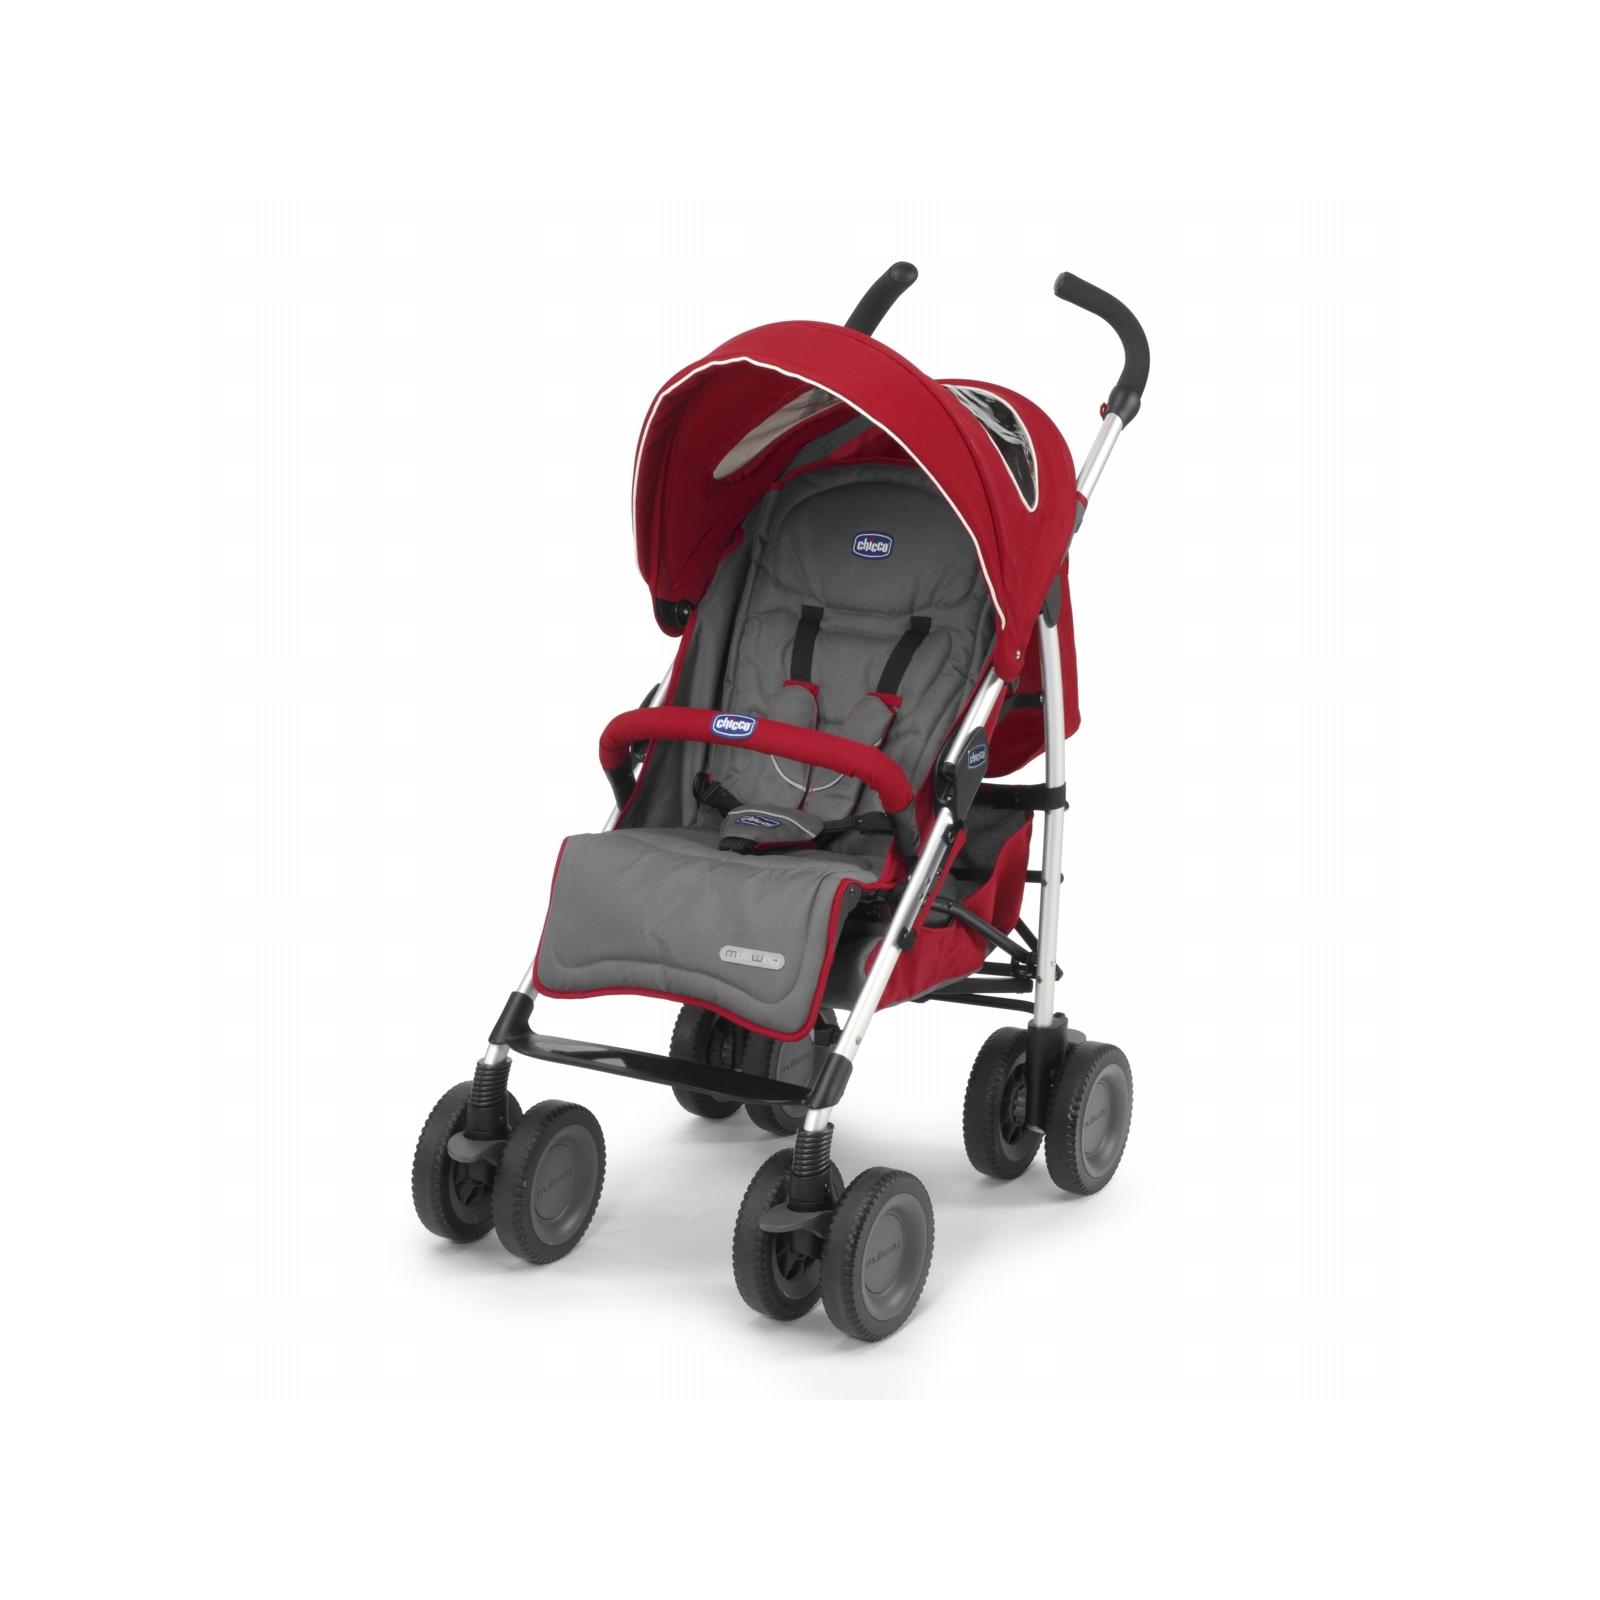 Коляска Chicco Multiway Evo Stroller Red (79315.70)